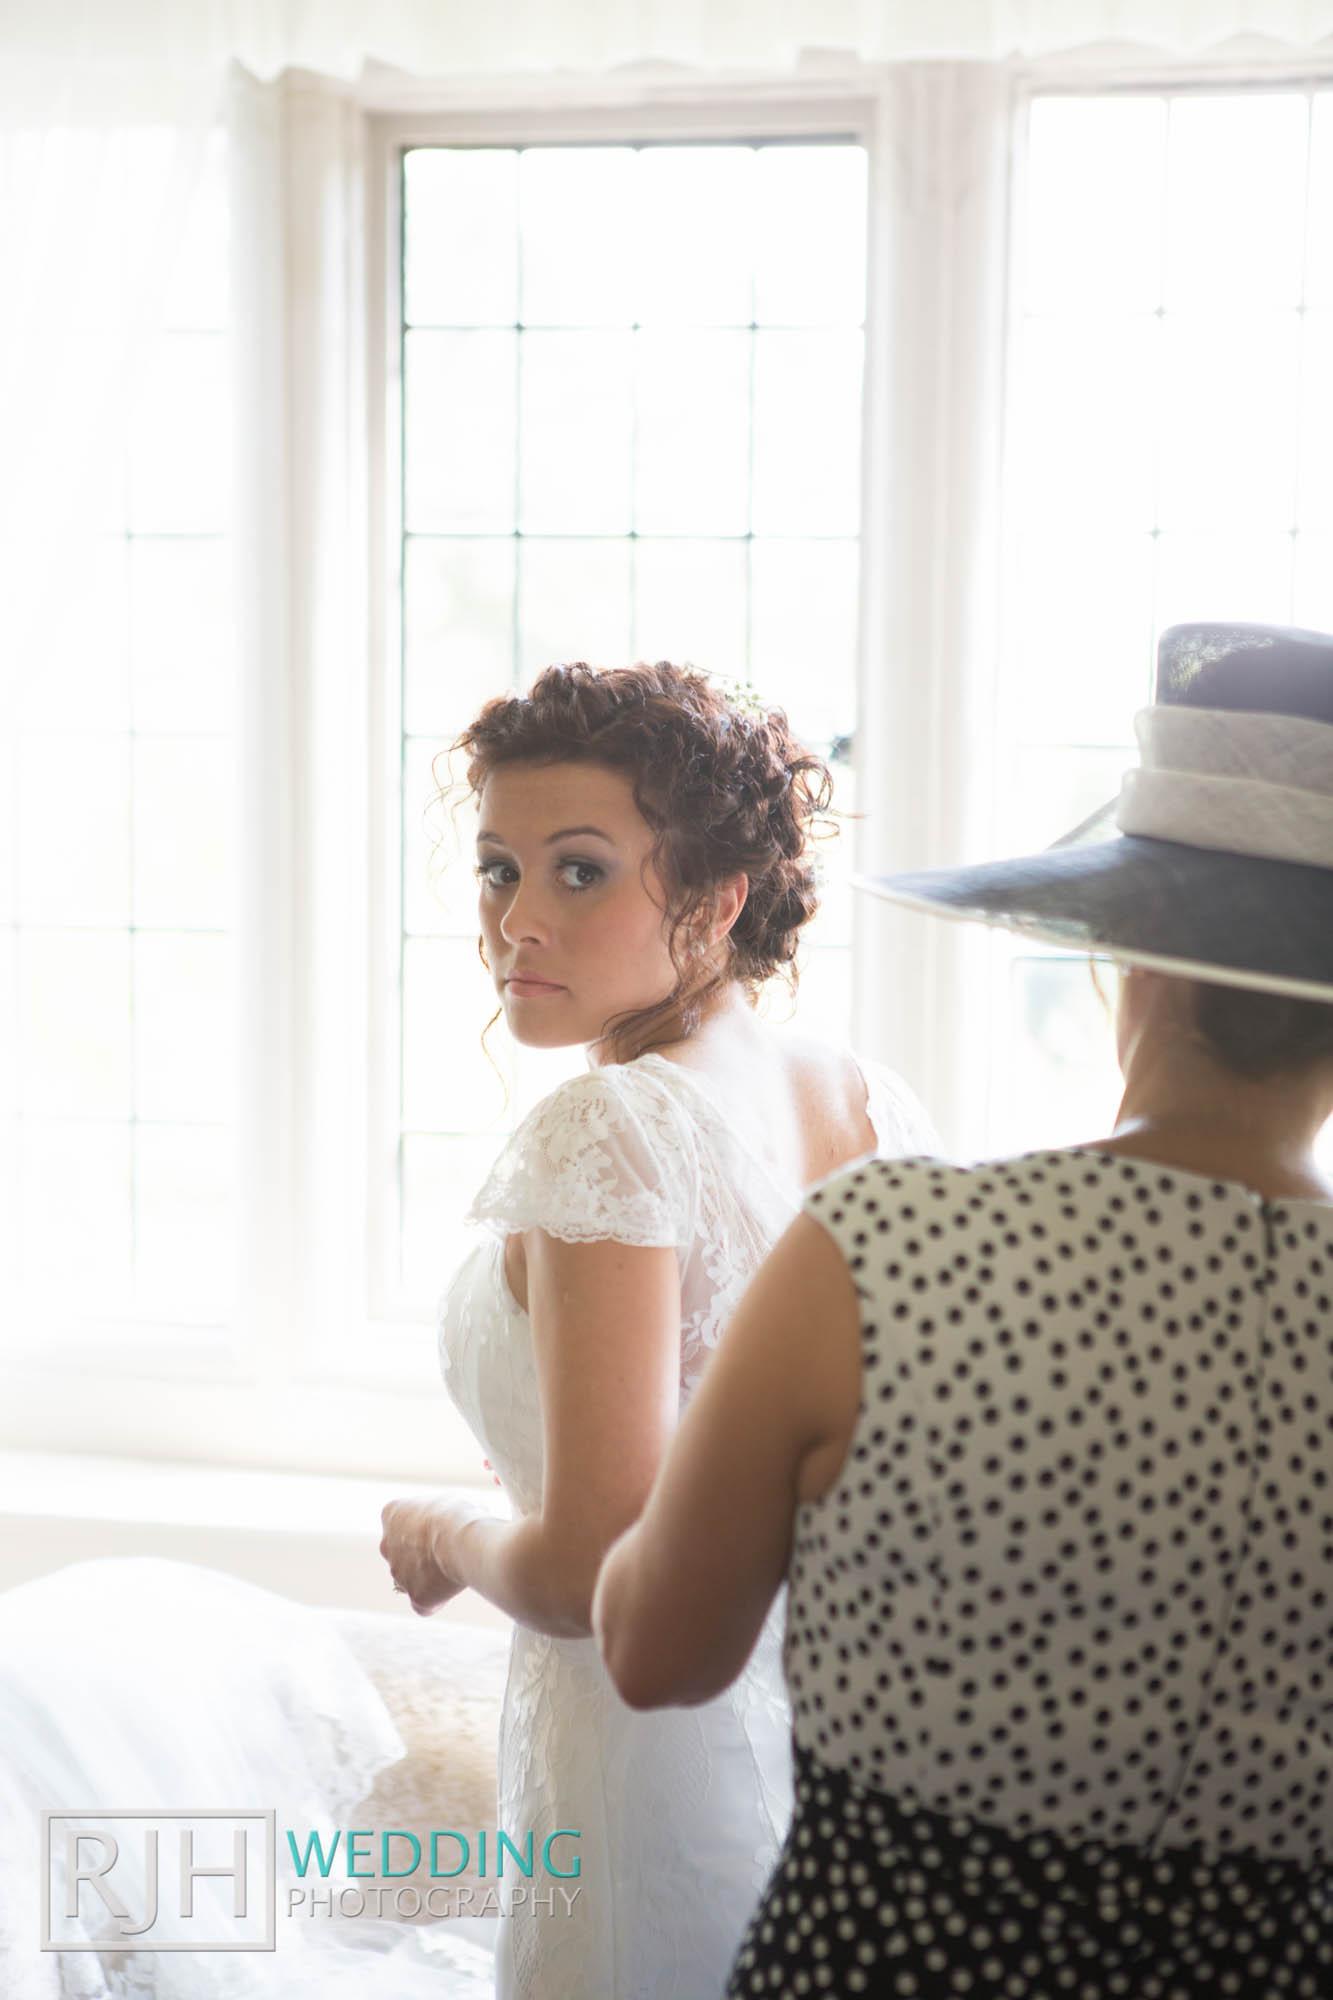 Whitley Hall Marples Wedding_101_3C2A8552.jpg